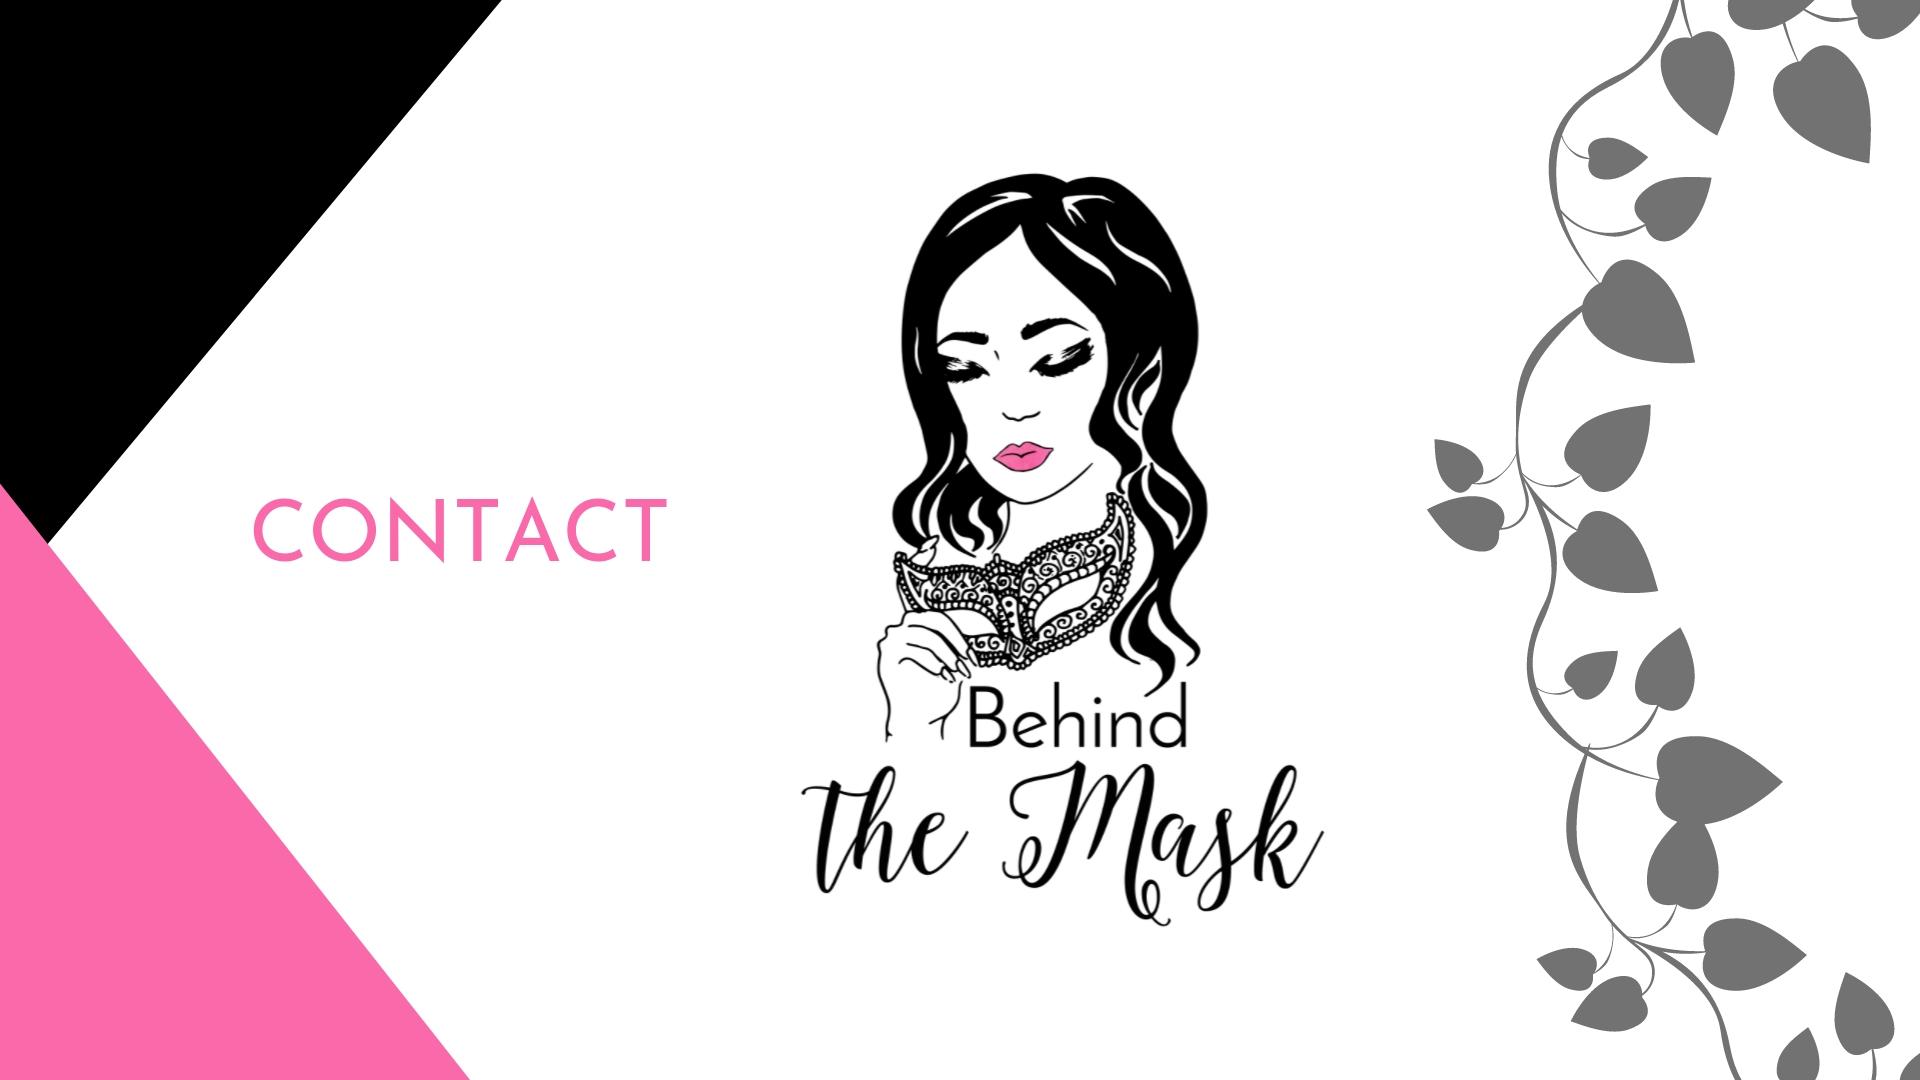 BehindTheMask-Contact